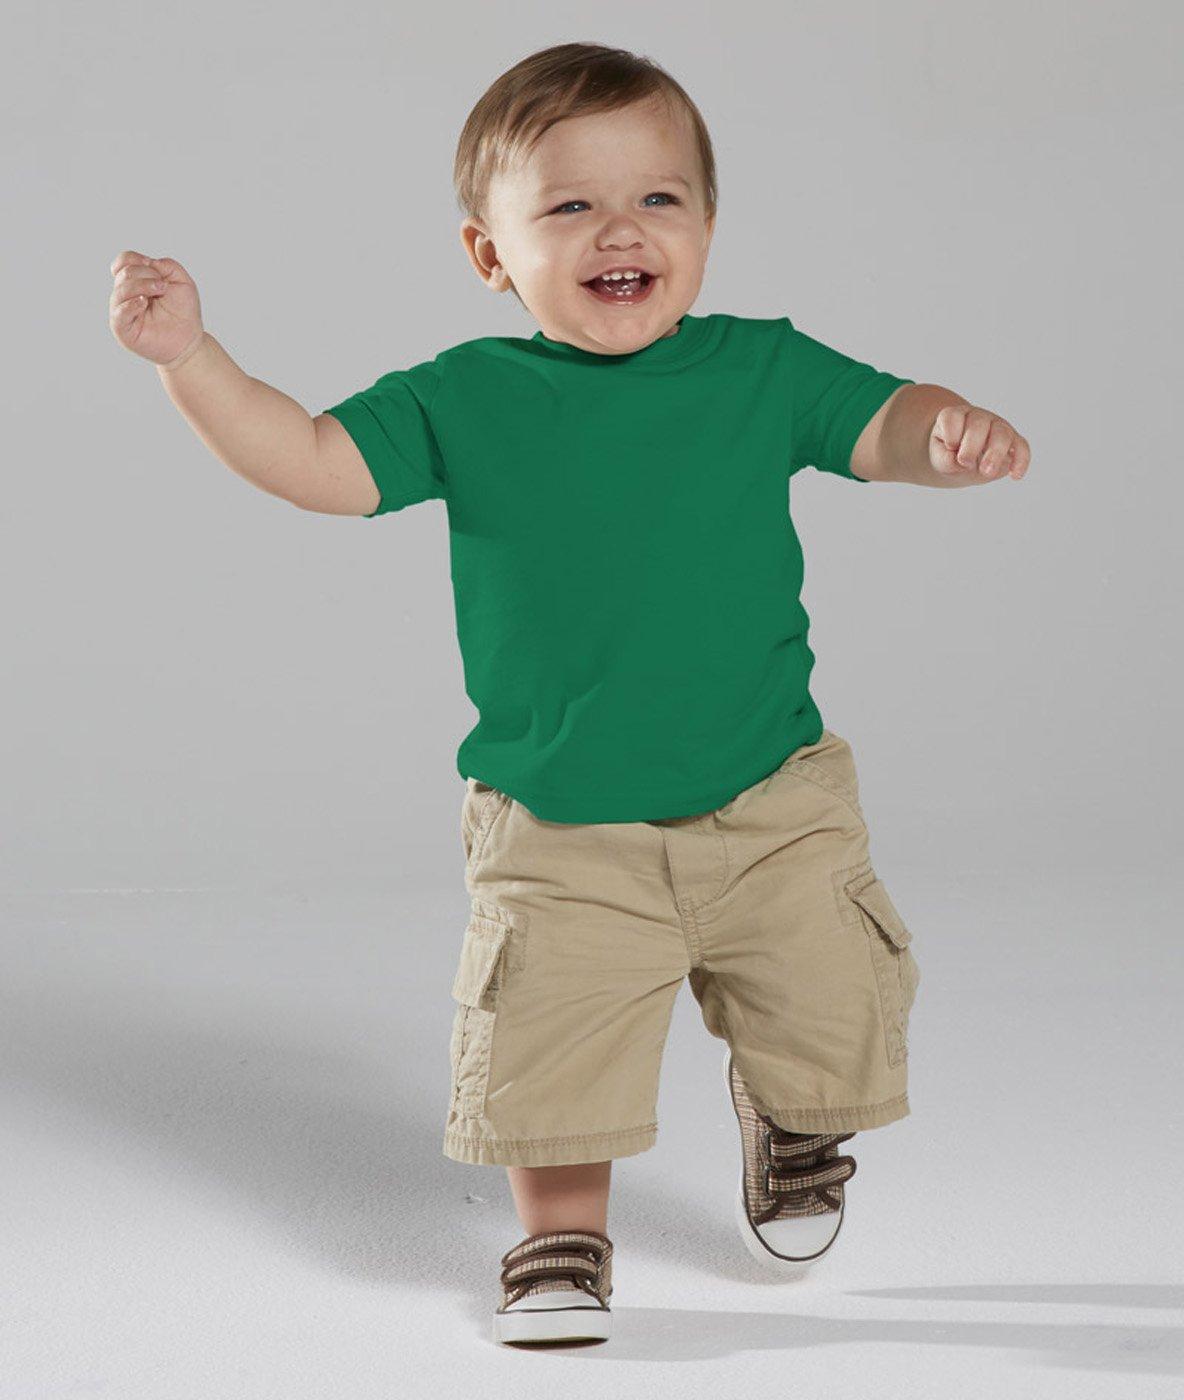 Rabbit Skins Infant Fine Topstitch Ribbed Collar T-Shirt, Kelly, 24 Months